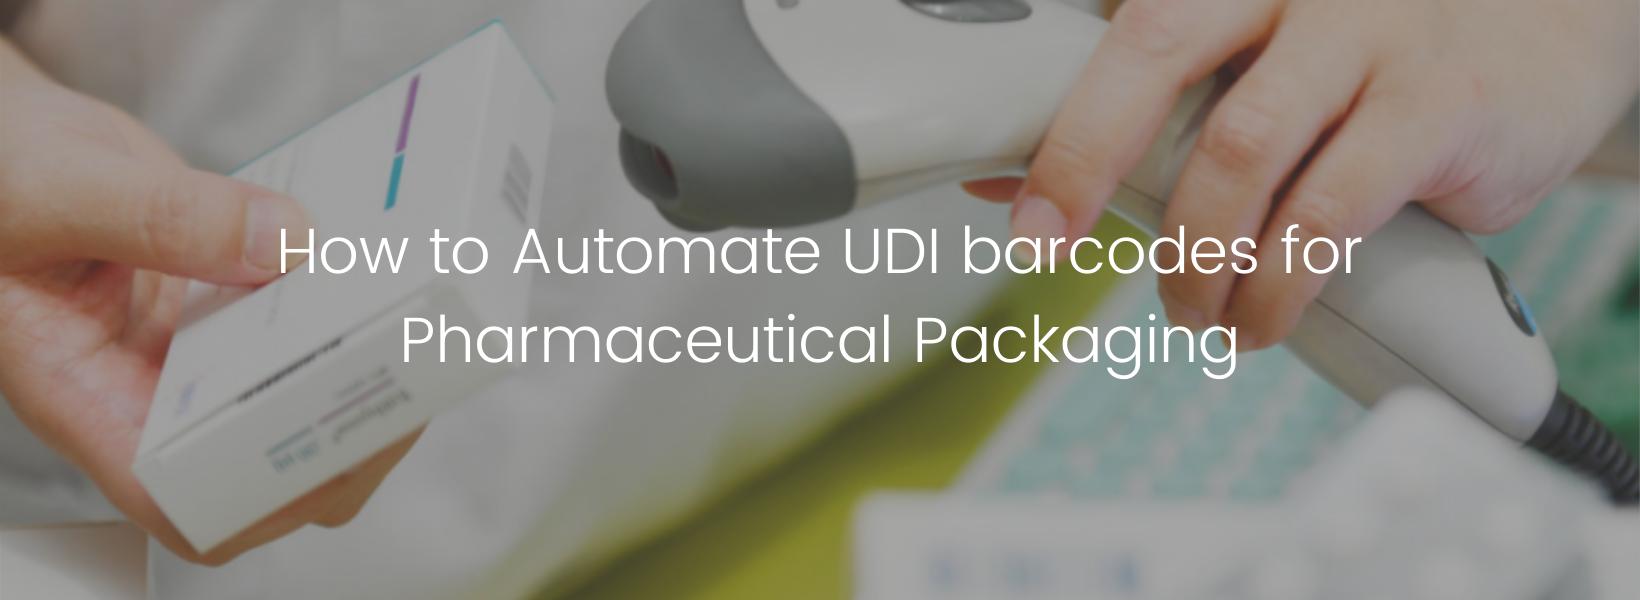 Automate UDI Barcodes_Blog (1)